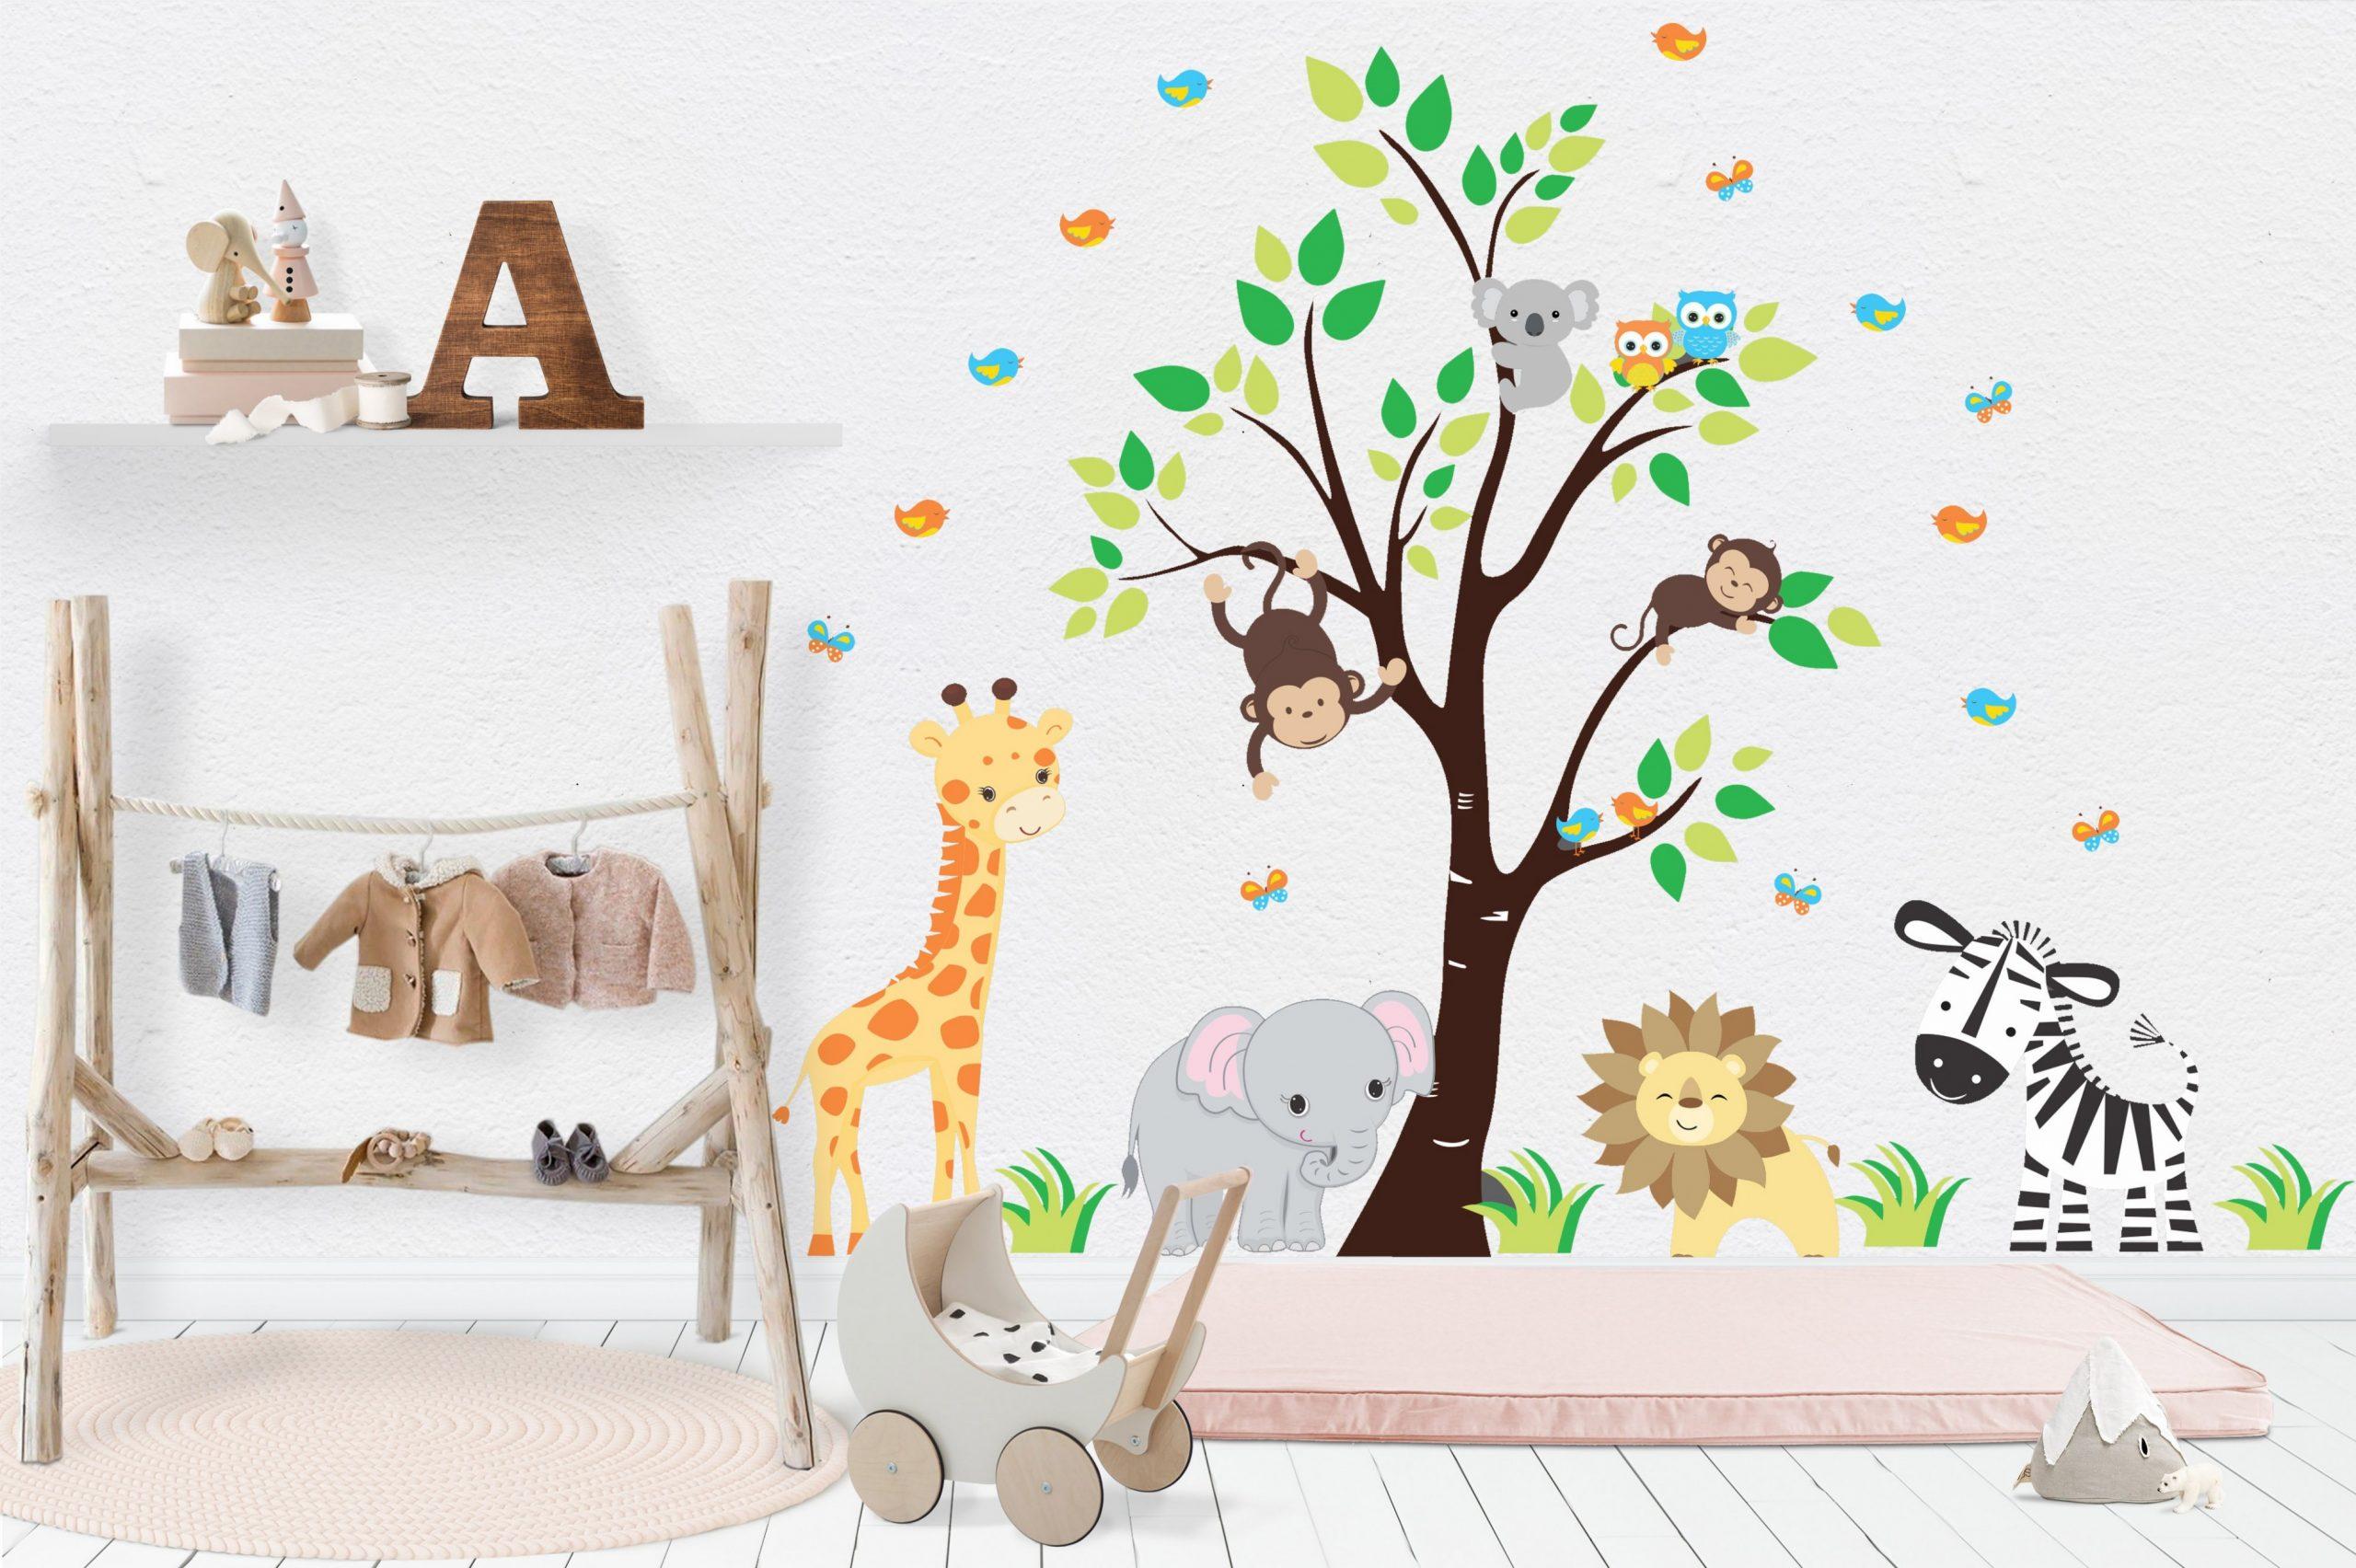 Nursery Wall Decals - Safari Nursery Stickers - Baby Room Decals  - Baby Room Decals